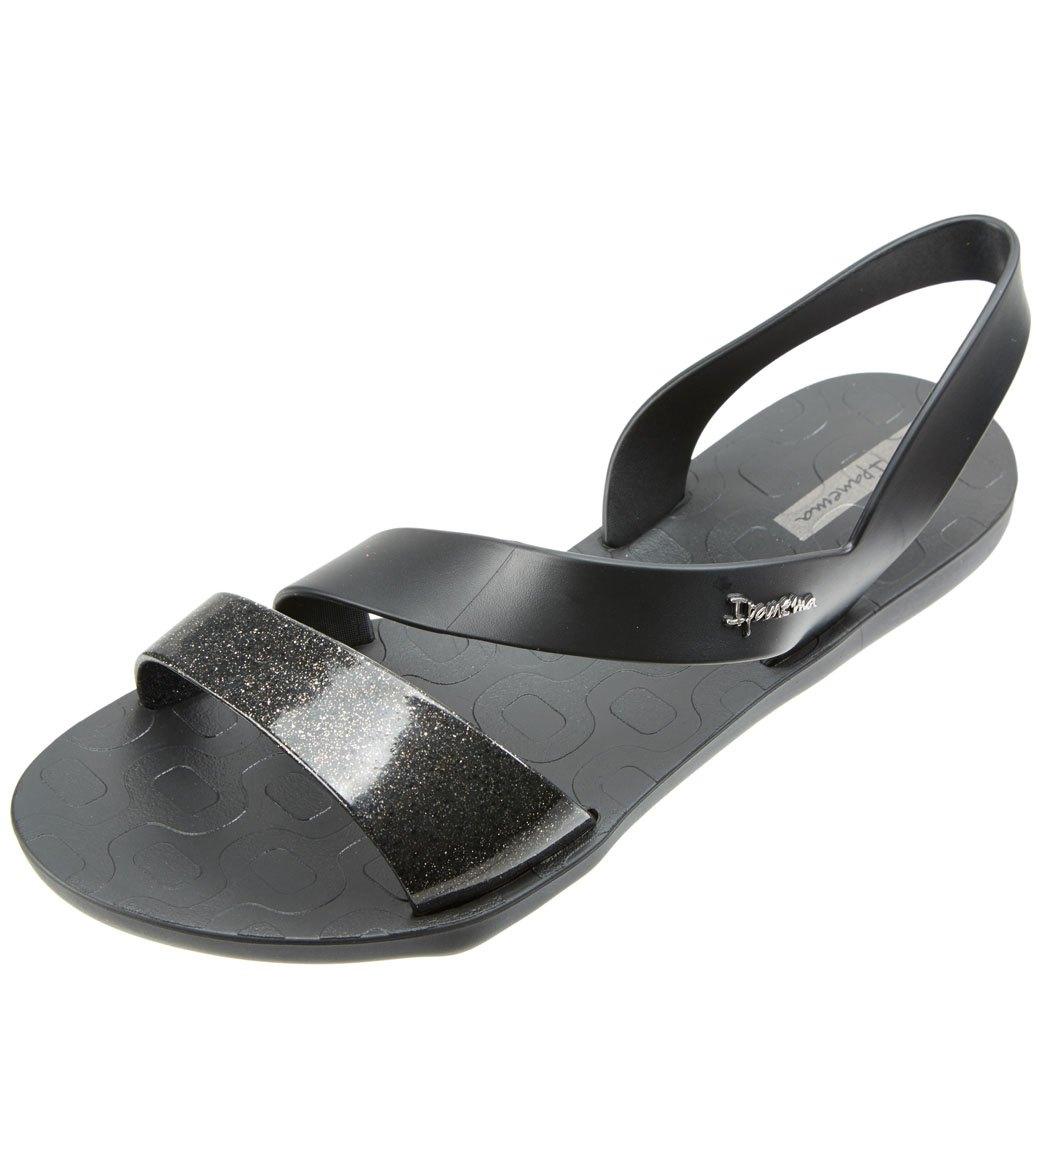 18d0363f27a8 Ipanema Women s Vibe Sandal at SwimOutlet.com